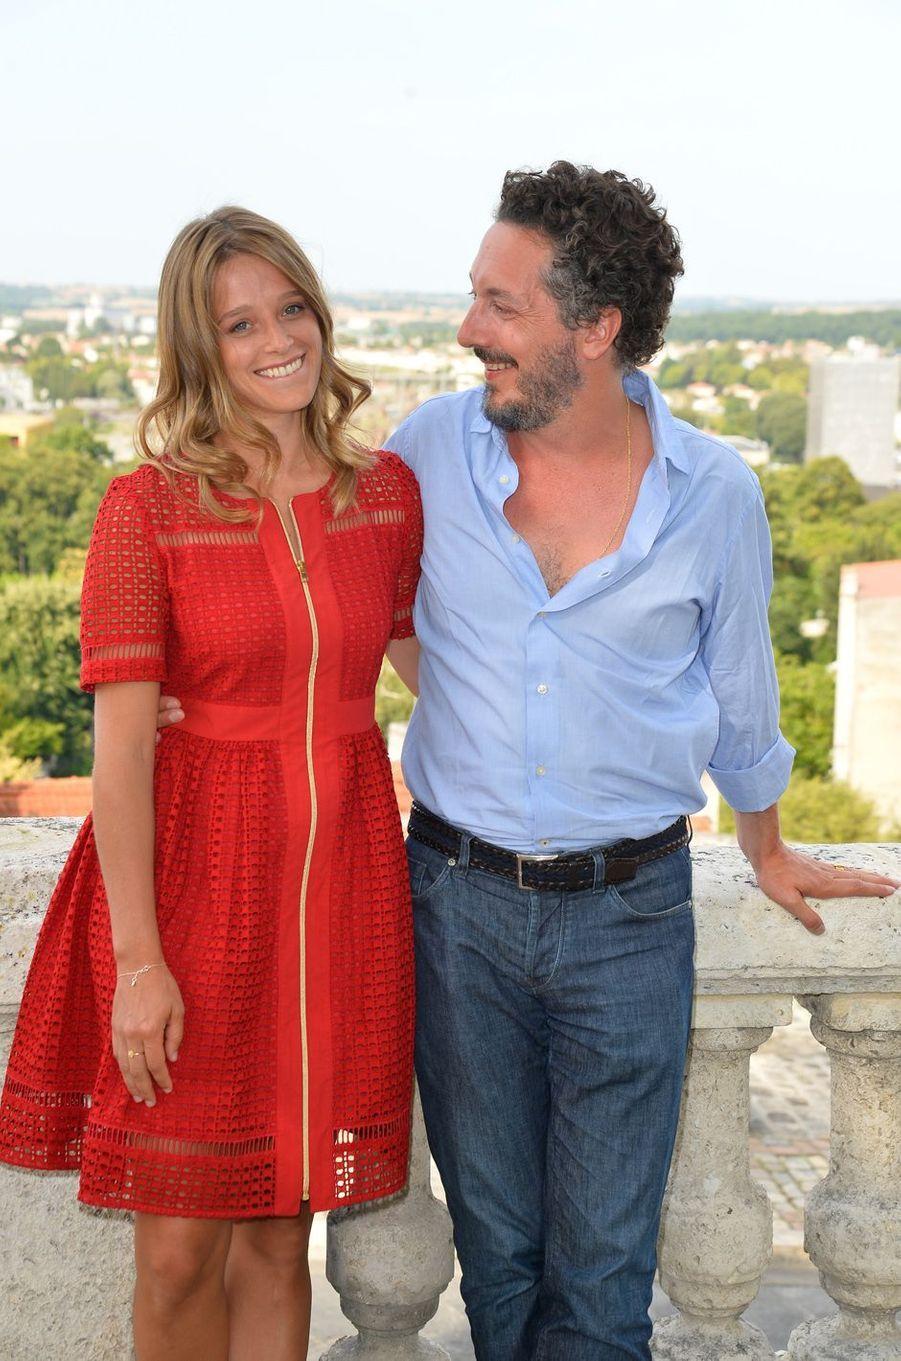 Guillaume Gallienne et Adeline d'Hermyau festival du film francophone d'Angoulême, le 24 août 2017.